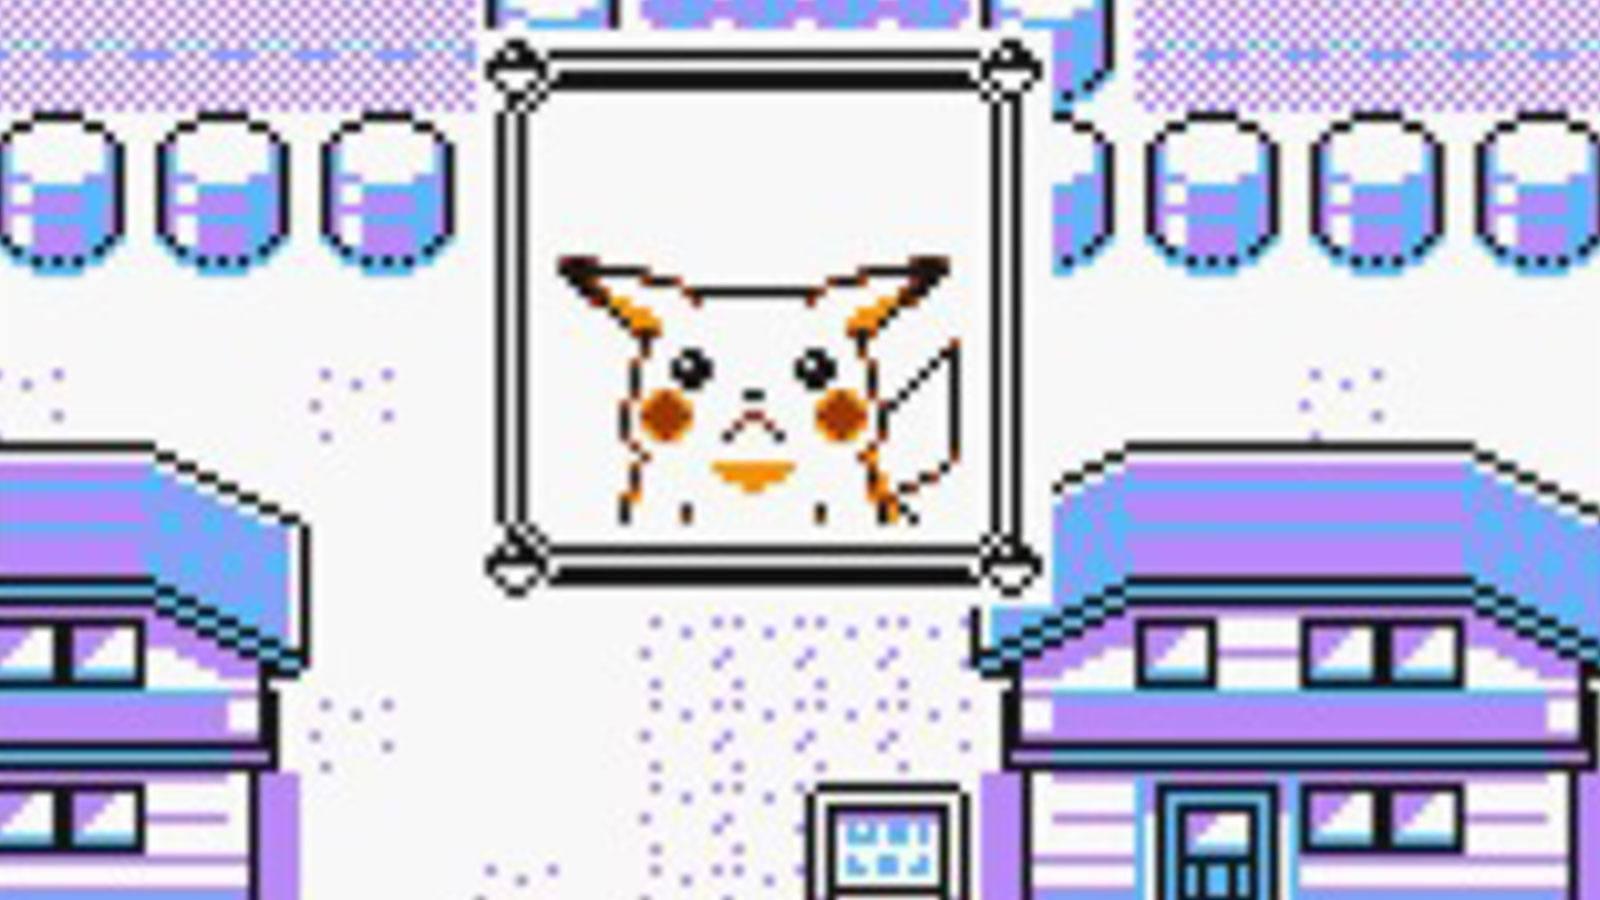 Pokémon Pikachu version Jaune Game Freak